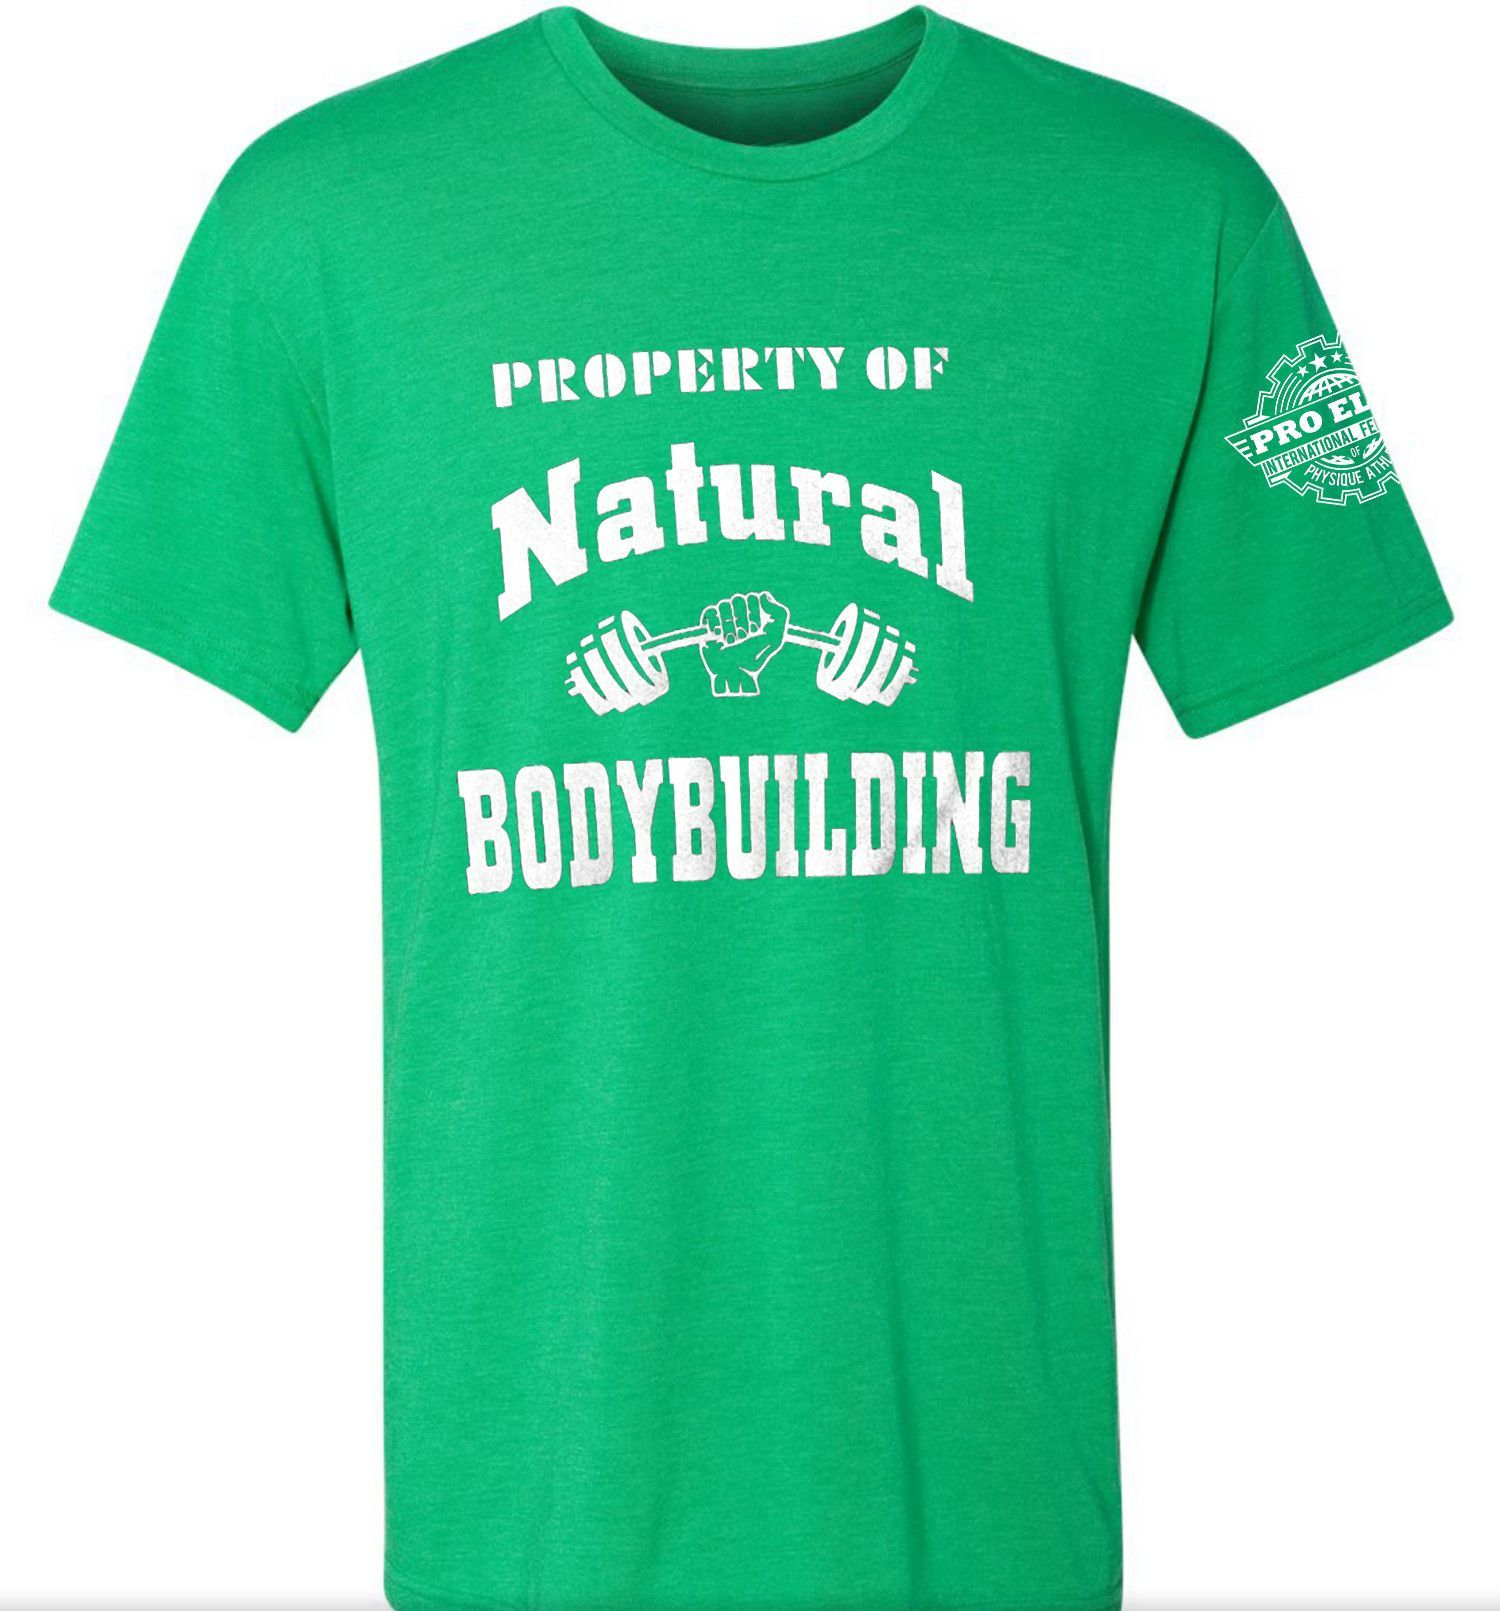 49b025dd0 Men's IFPAProElite Natural Bodybuilding T-Shirt - Green ...